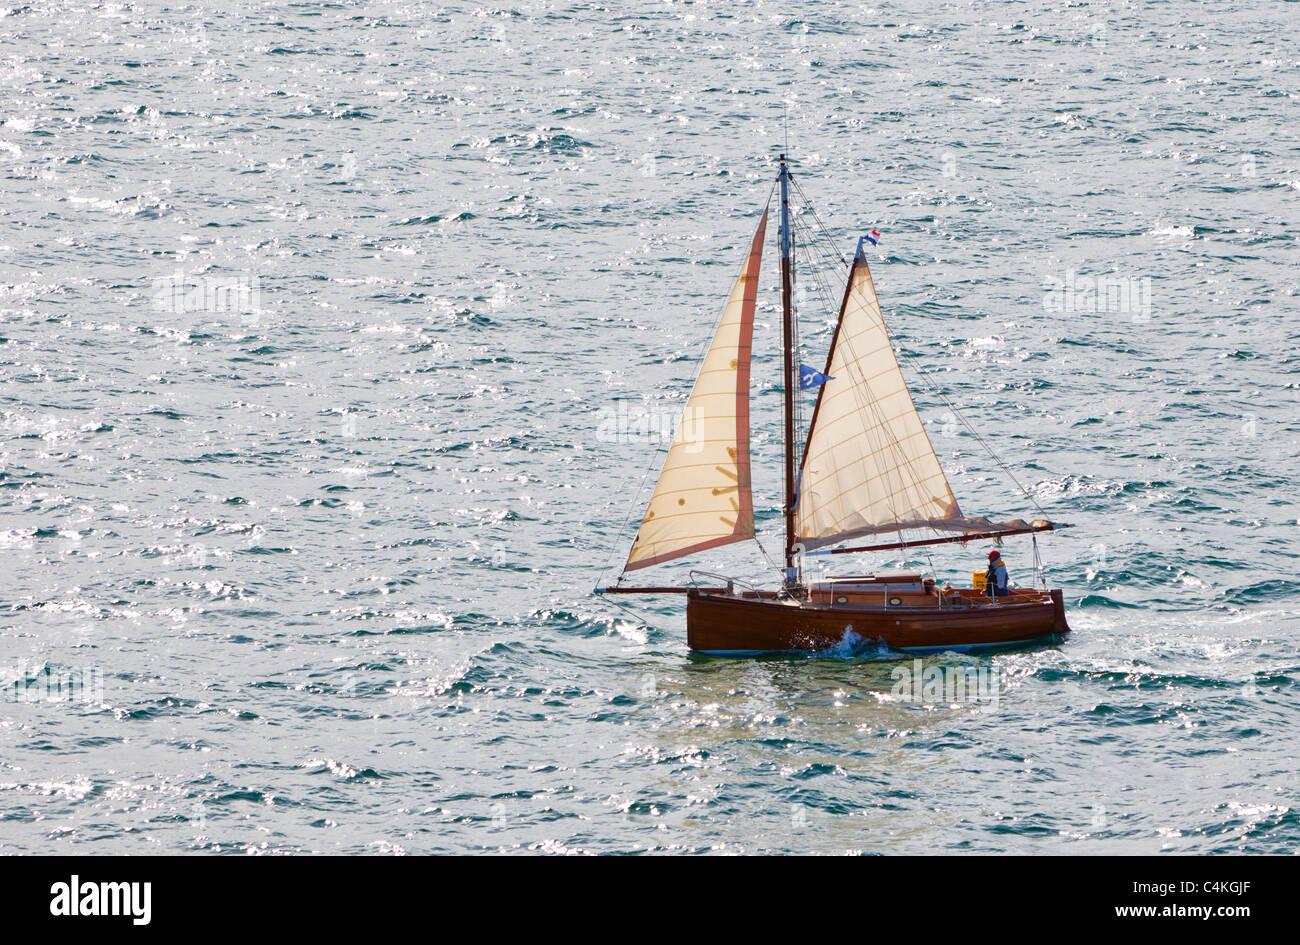 Small wooden sailing yacht at sea France Europe - Stock Image